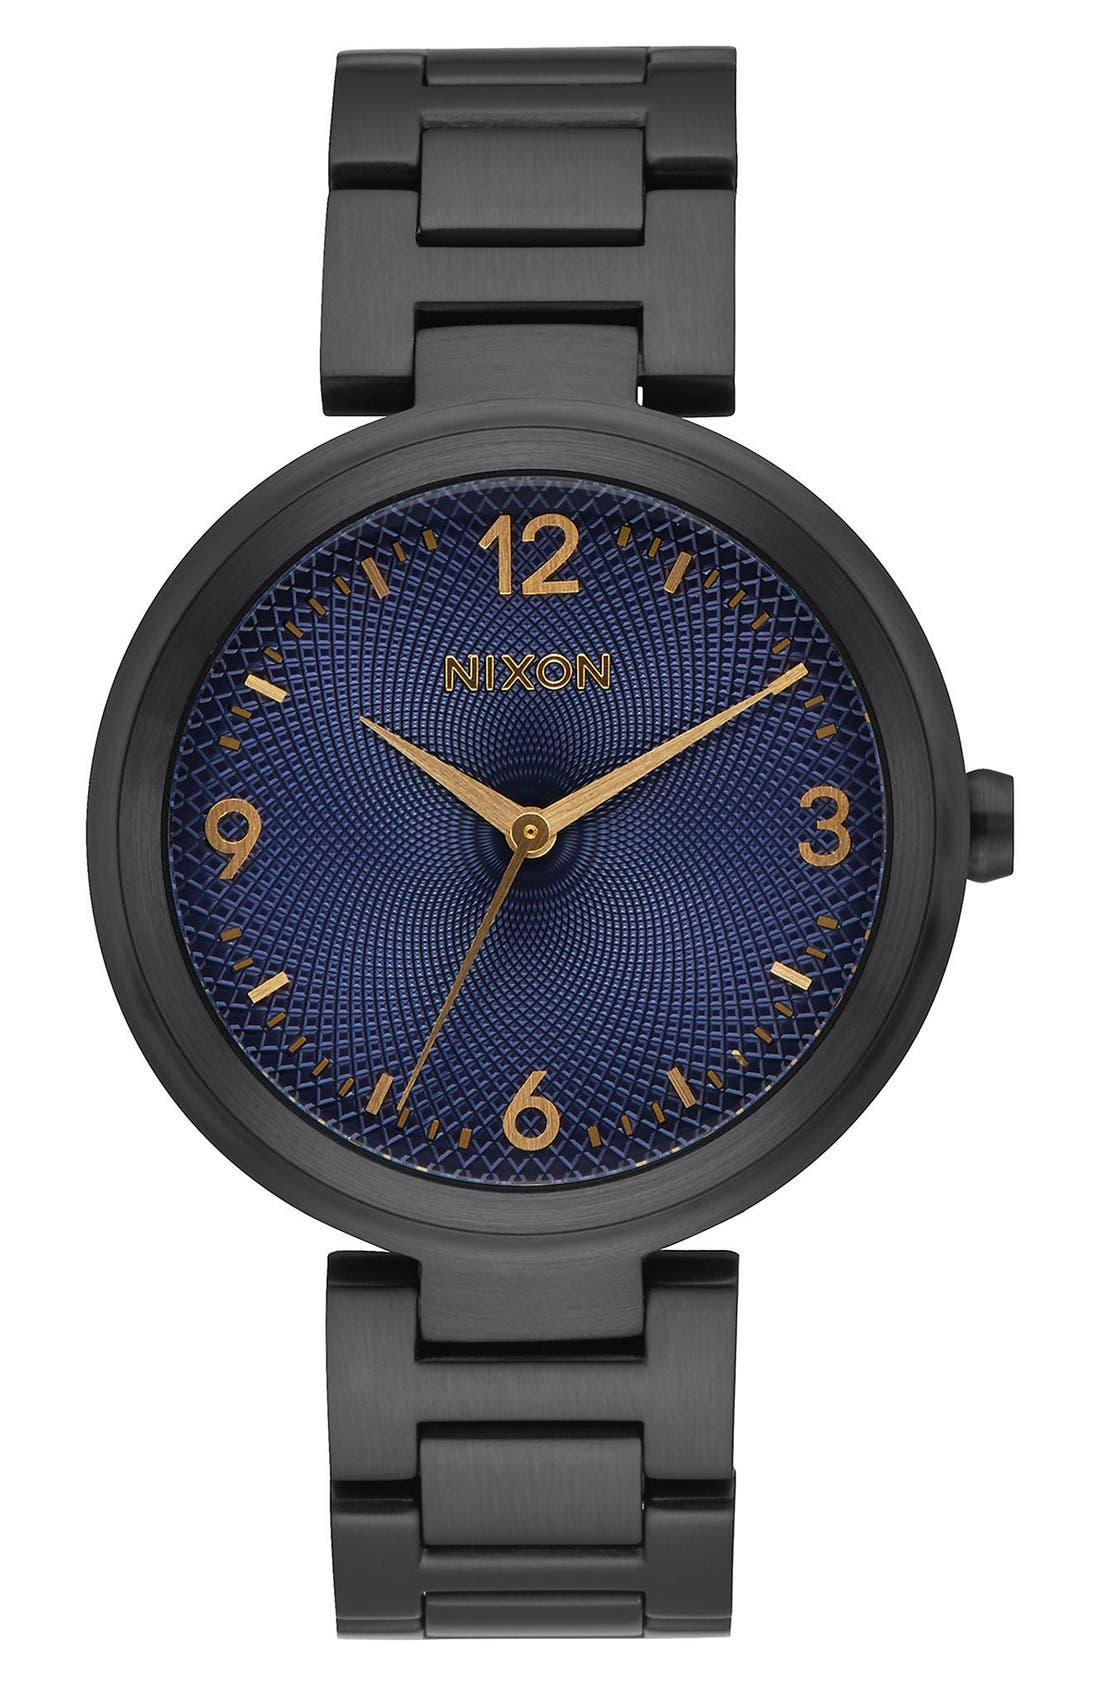 Main Image - Nixon 'Chameleon' Bracelet Watch, 39mm